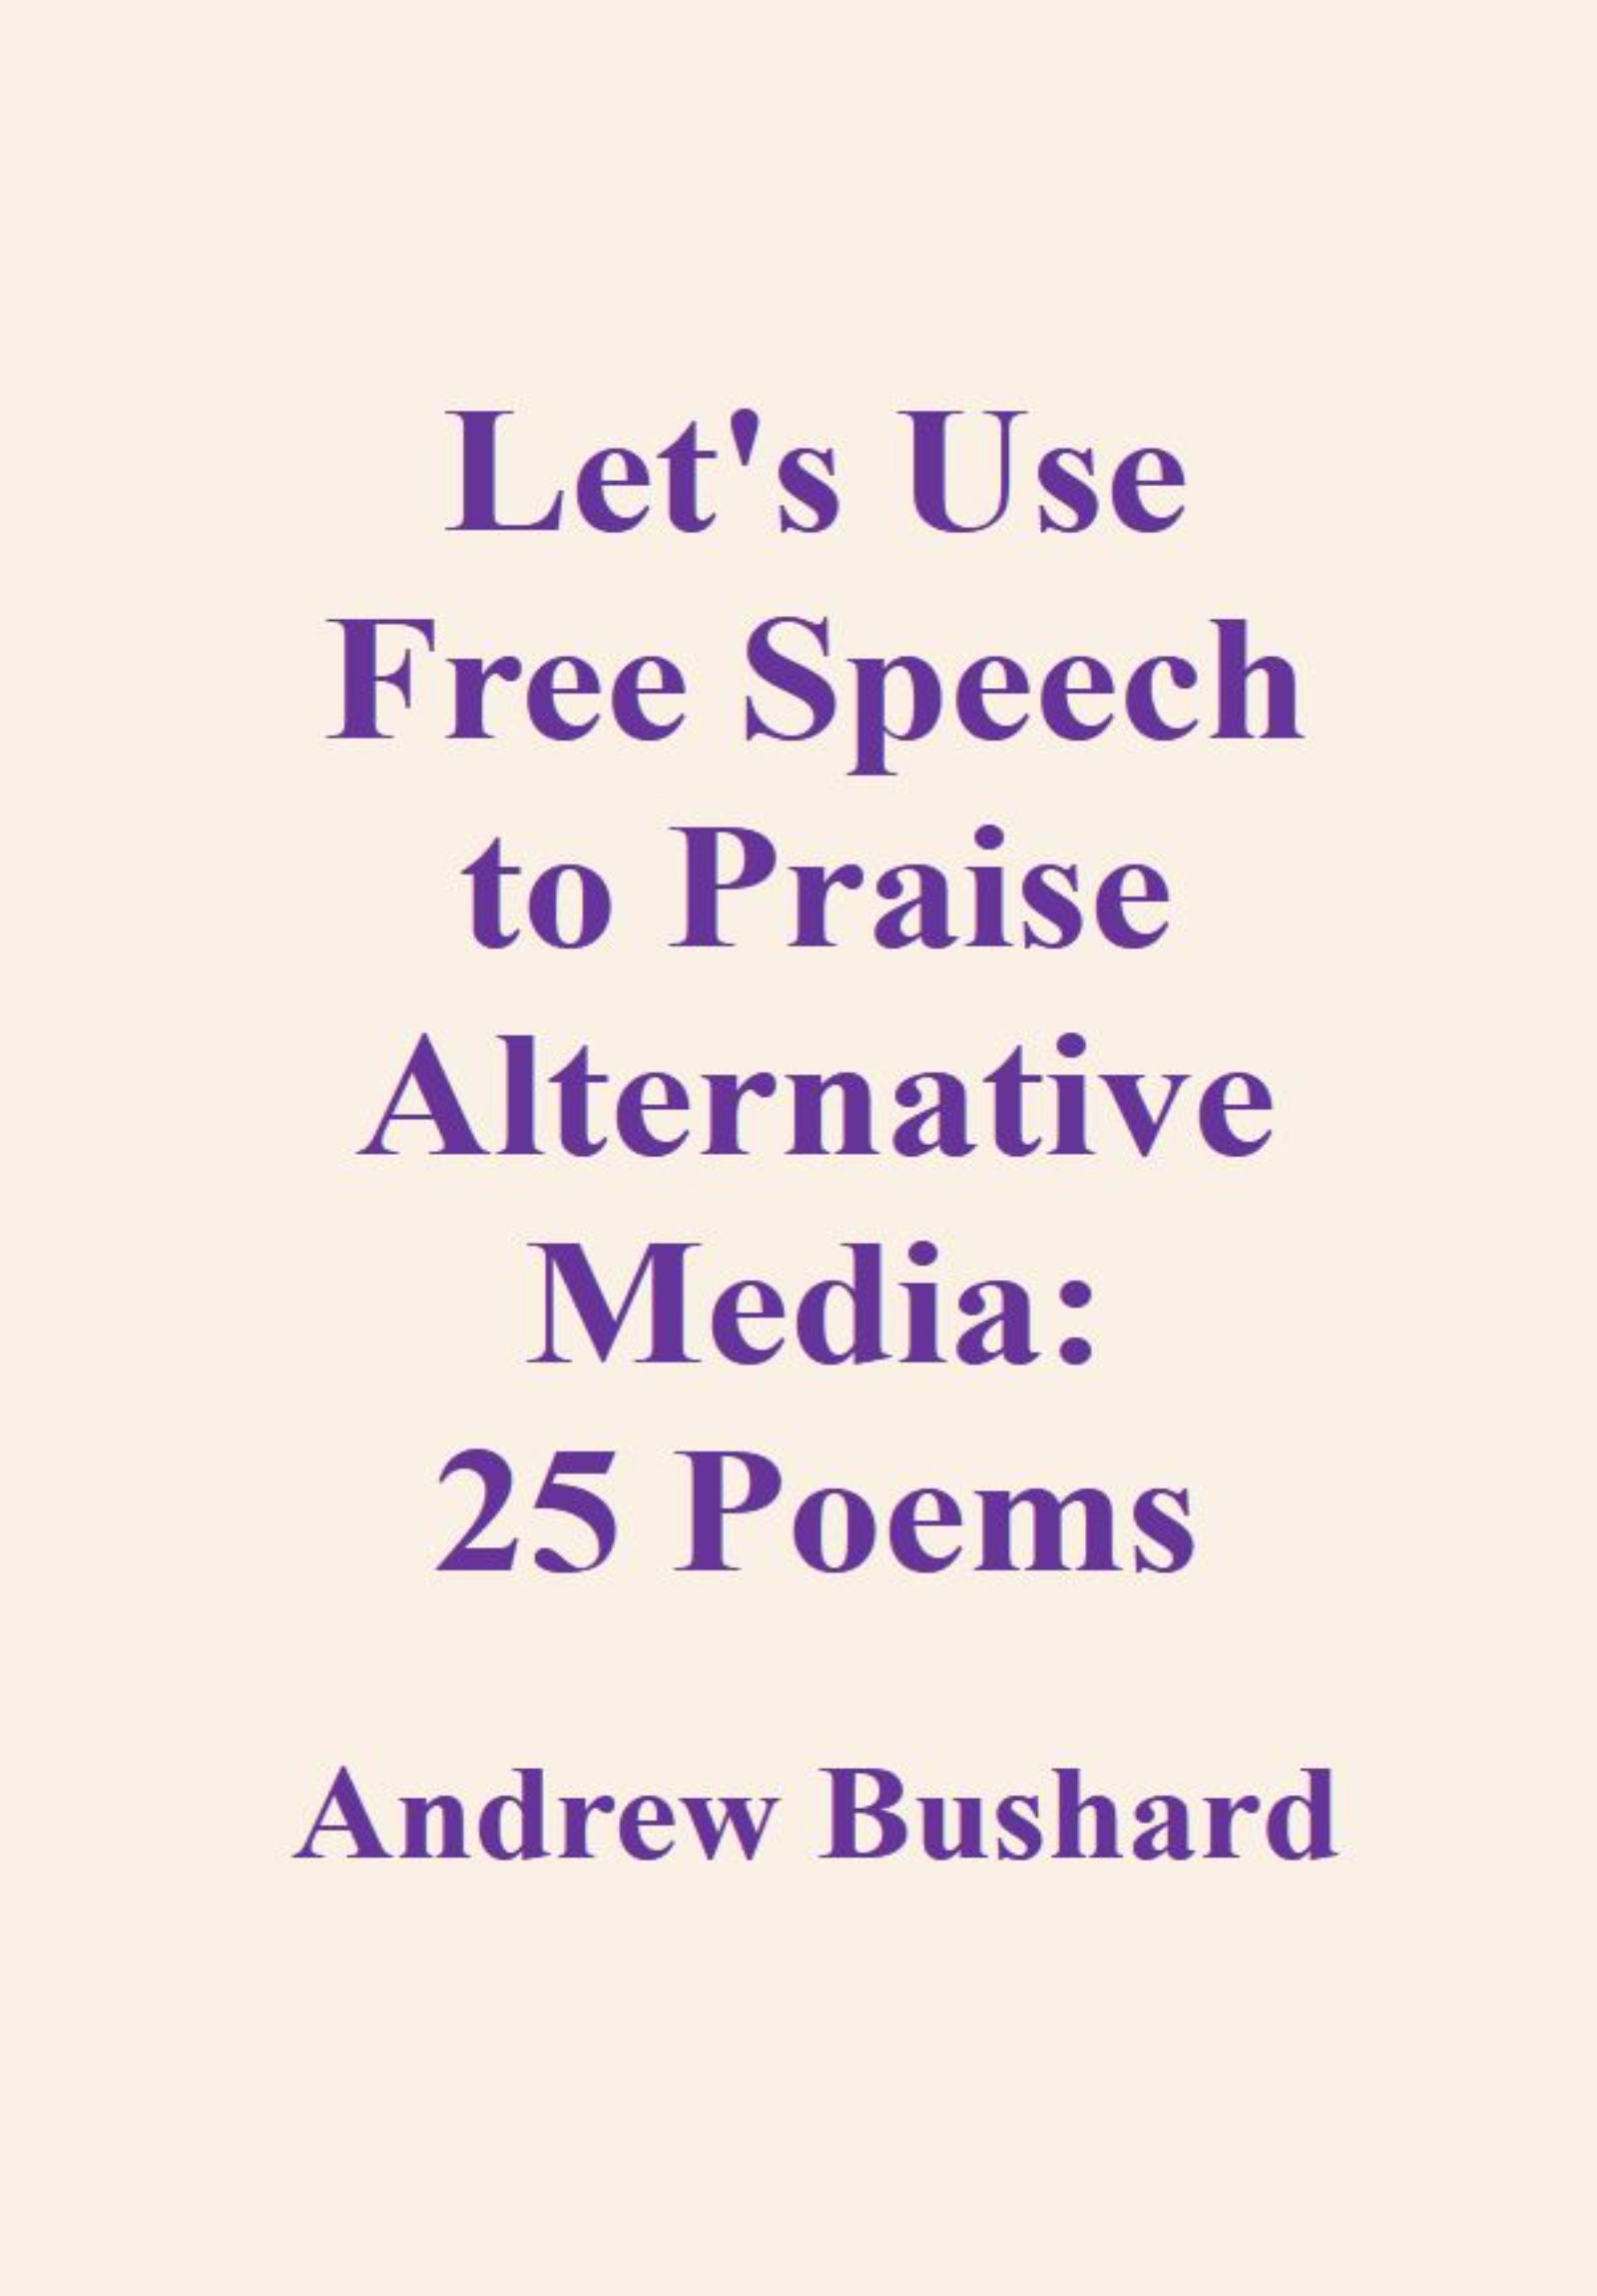 Let's Use Free Speech to Praise Alternative Media: 25 Poems